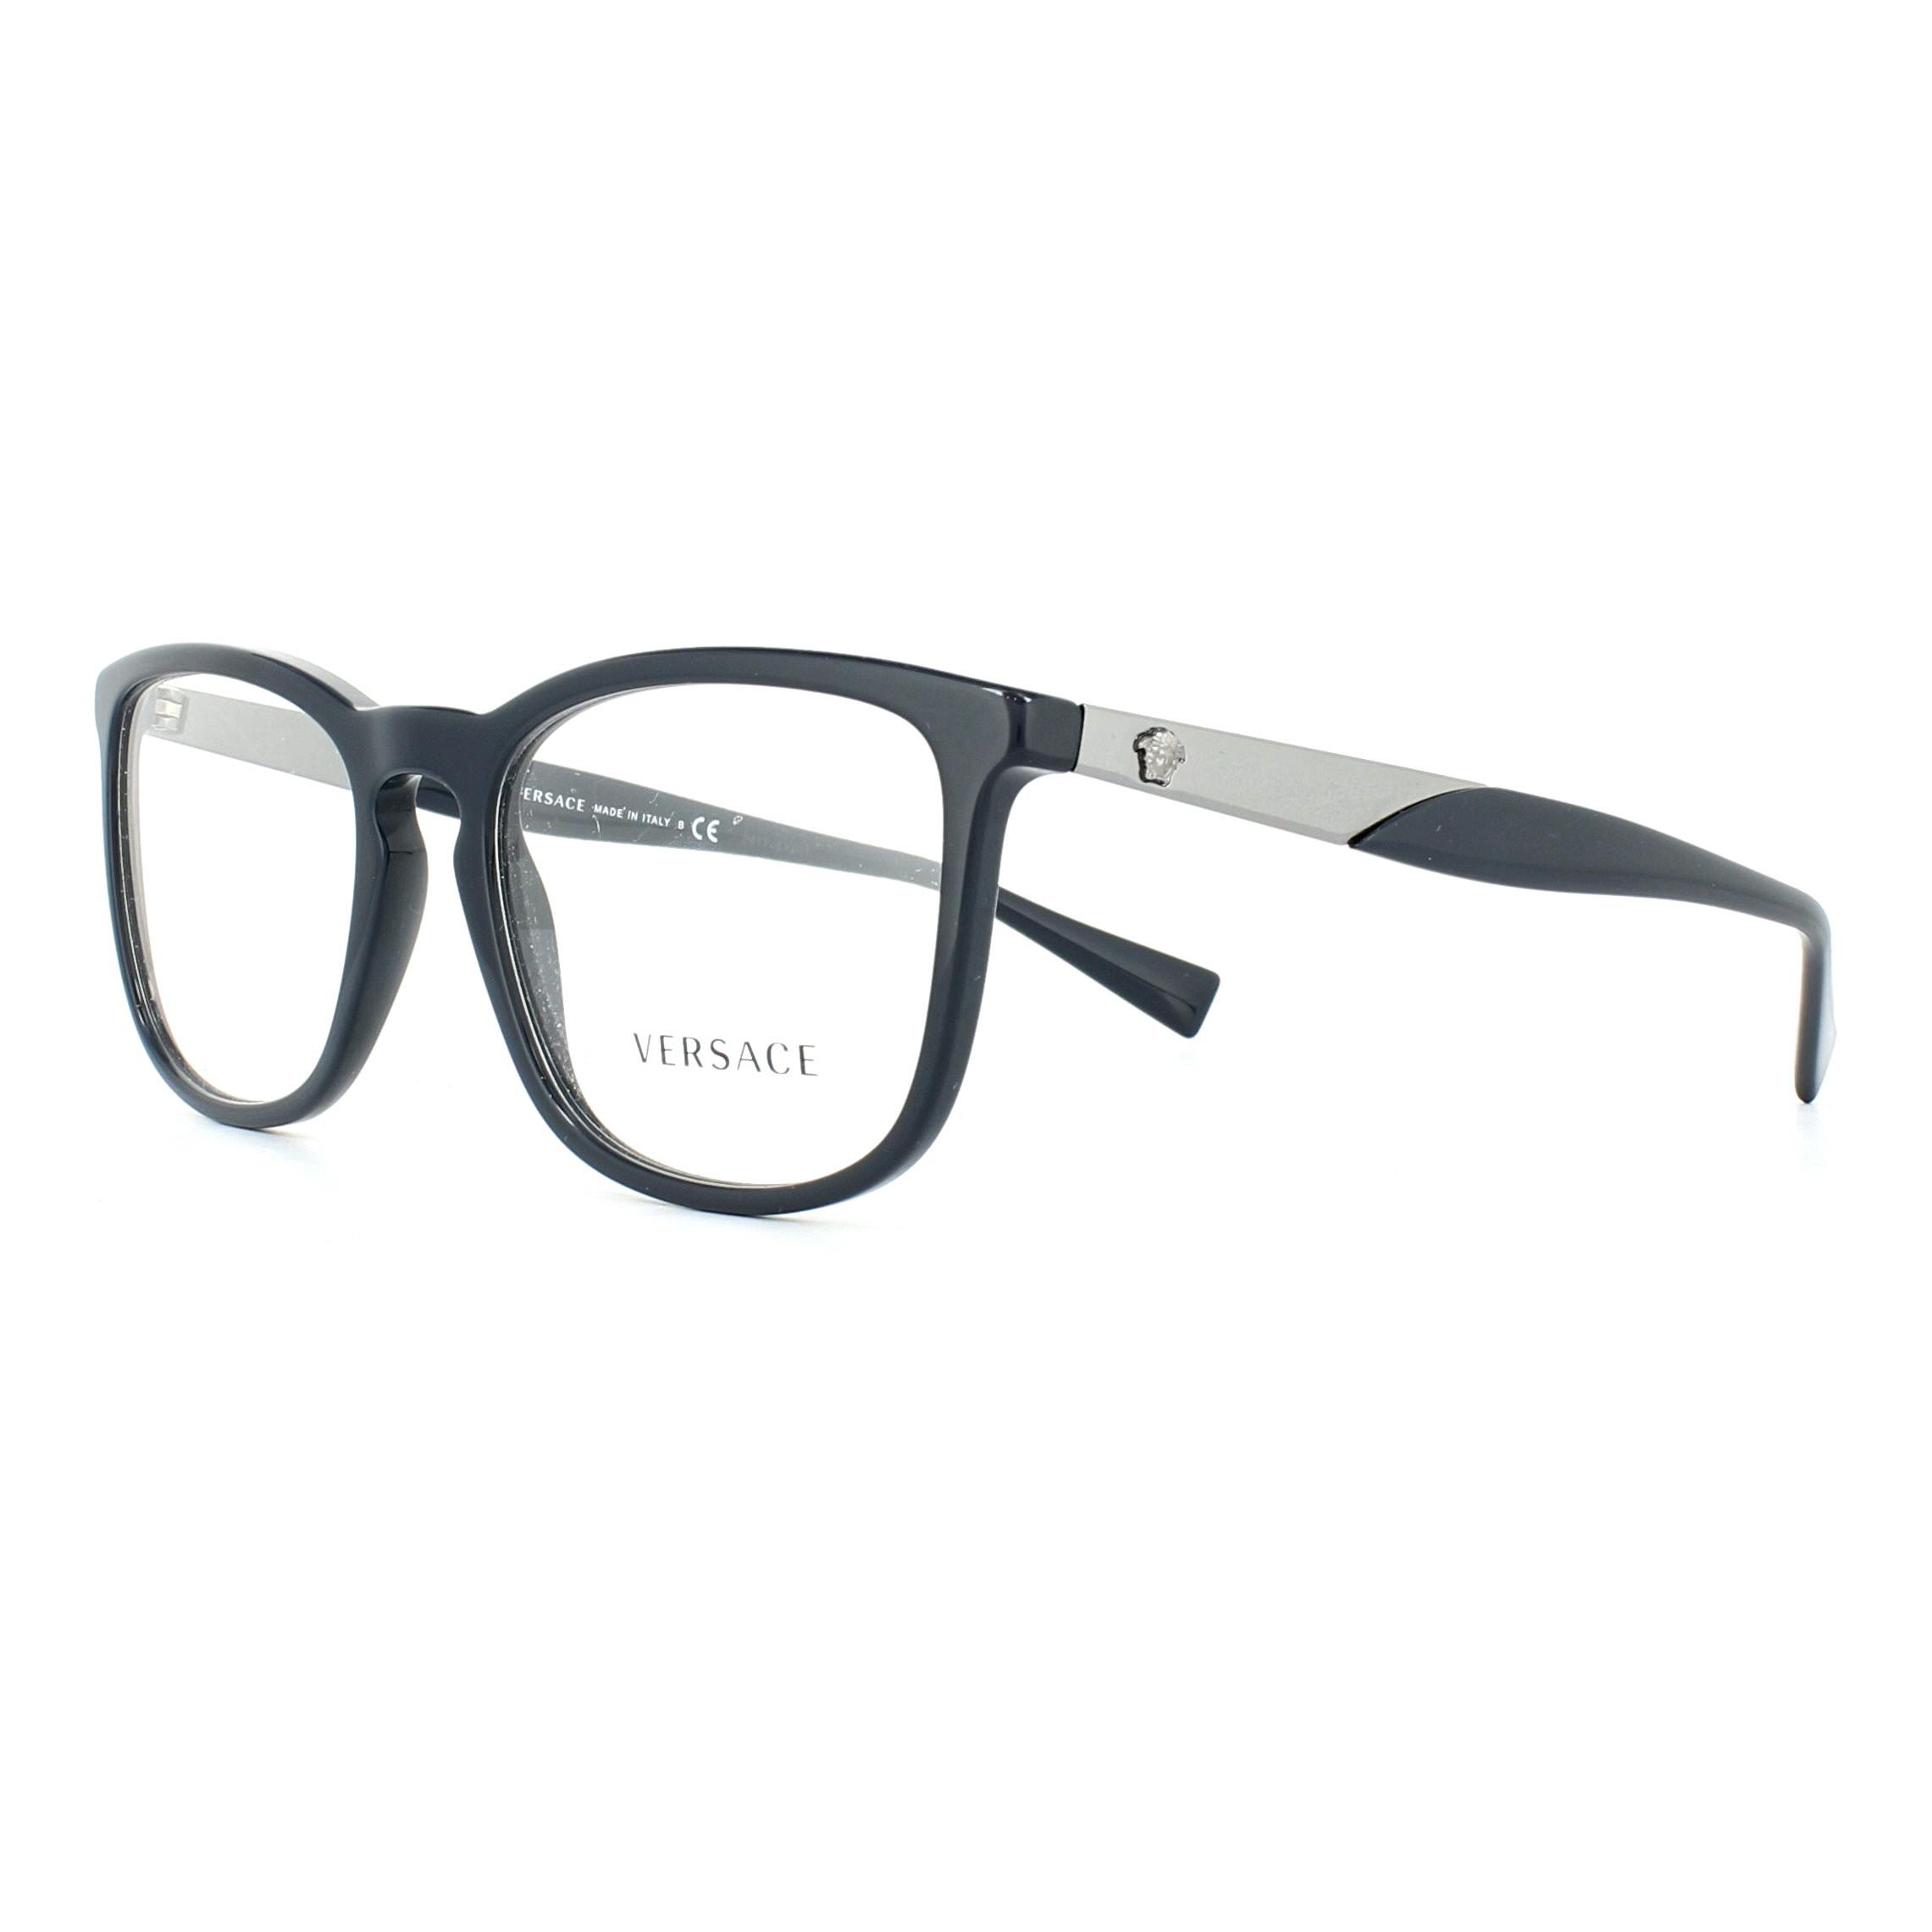 eb7743f61d Sentinel Versace Glasses Frames 3252 5230 Dark Blue 52mm Mens Womens